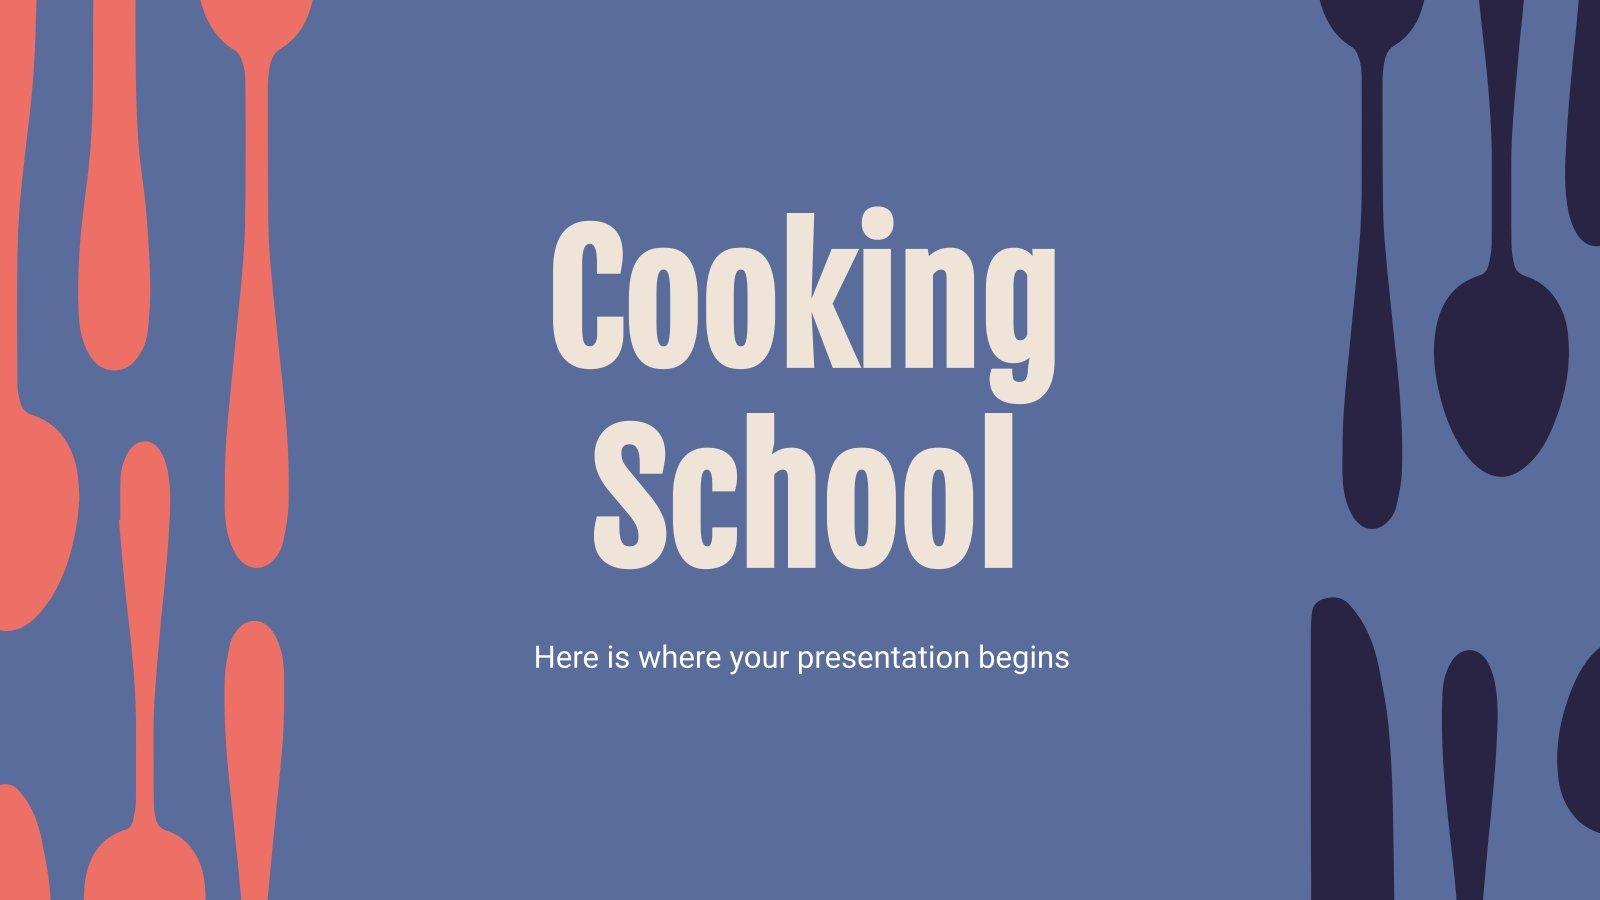 Cooking School presentation template